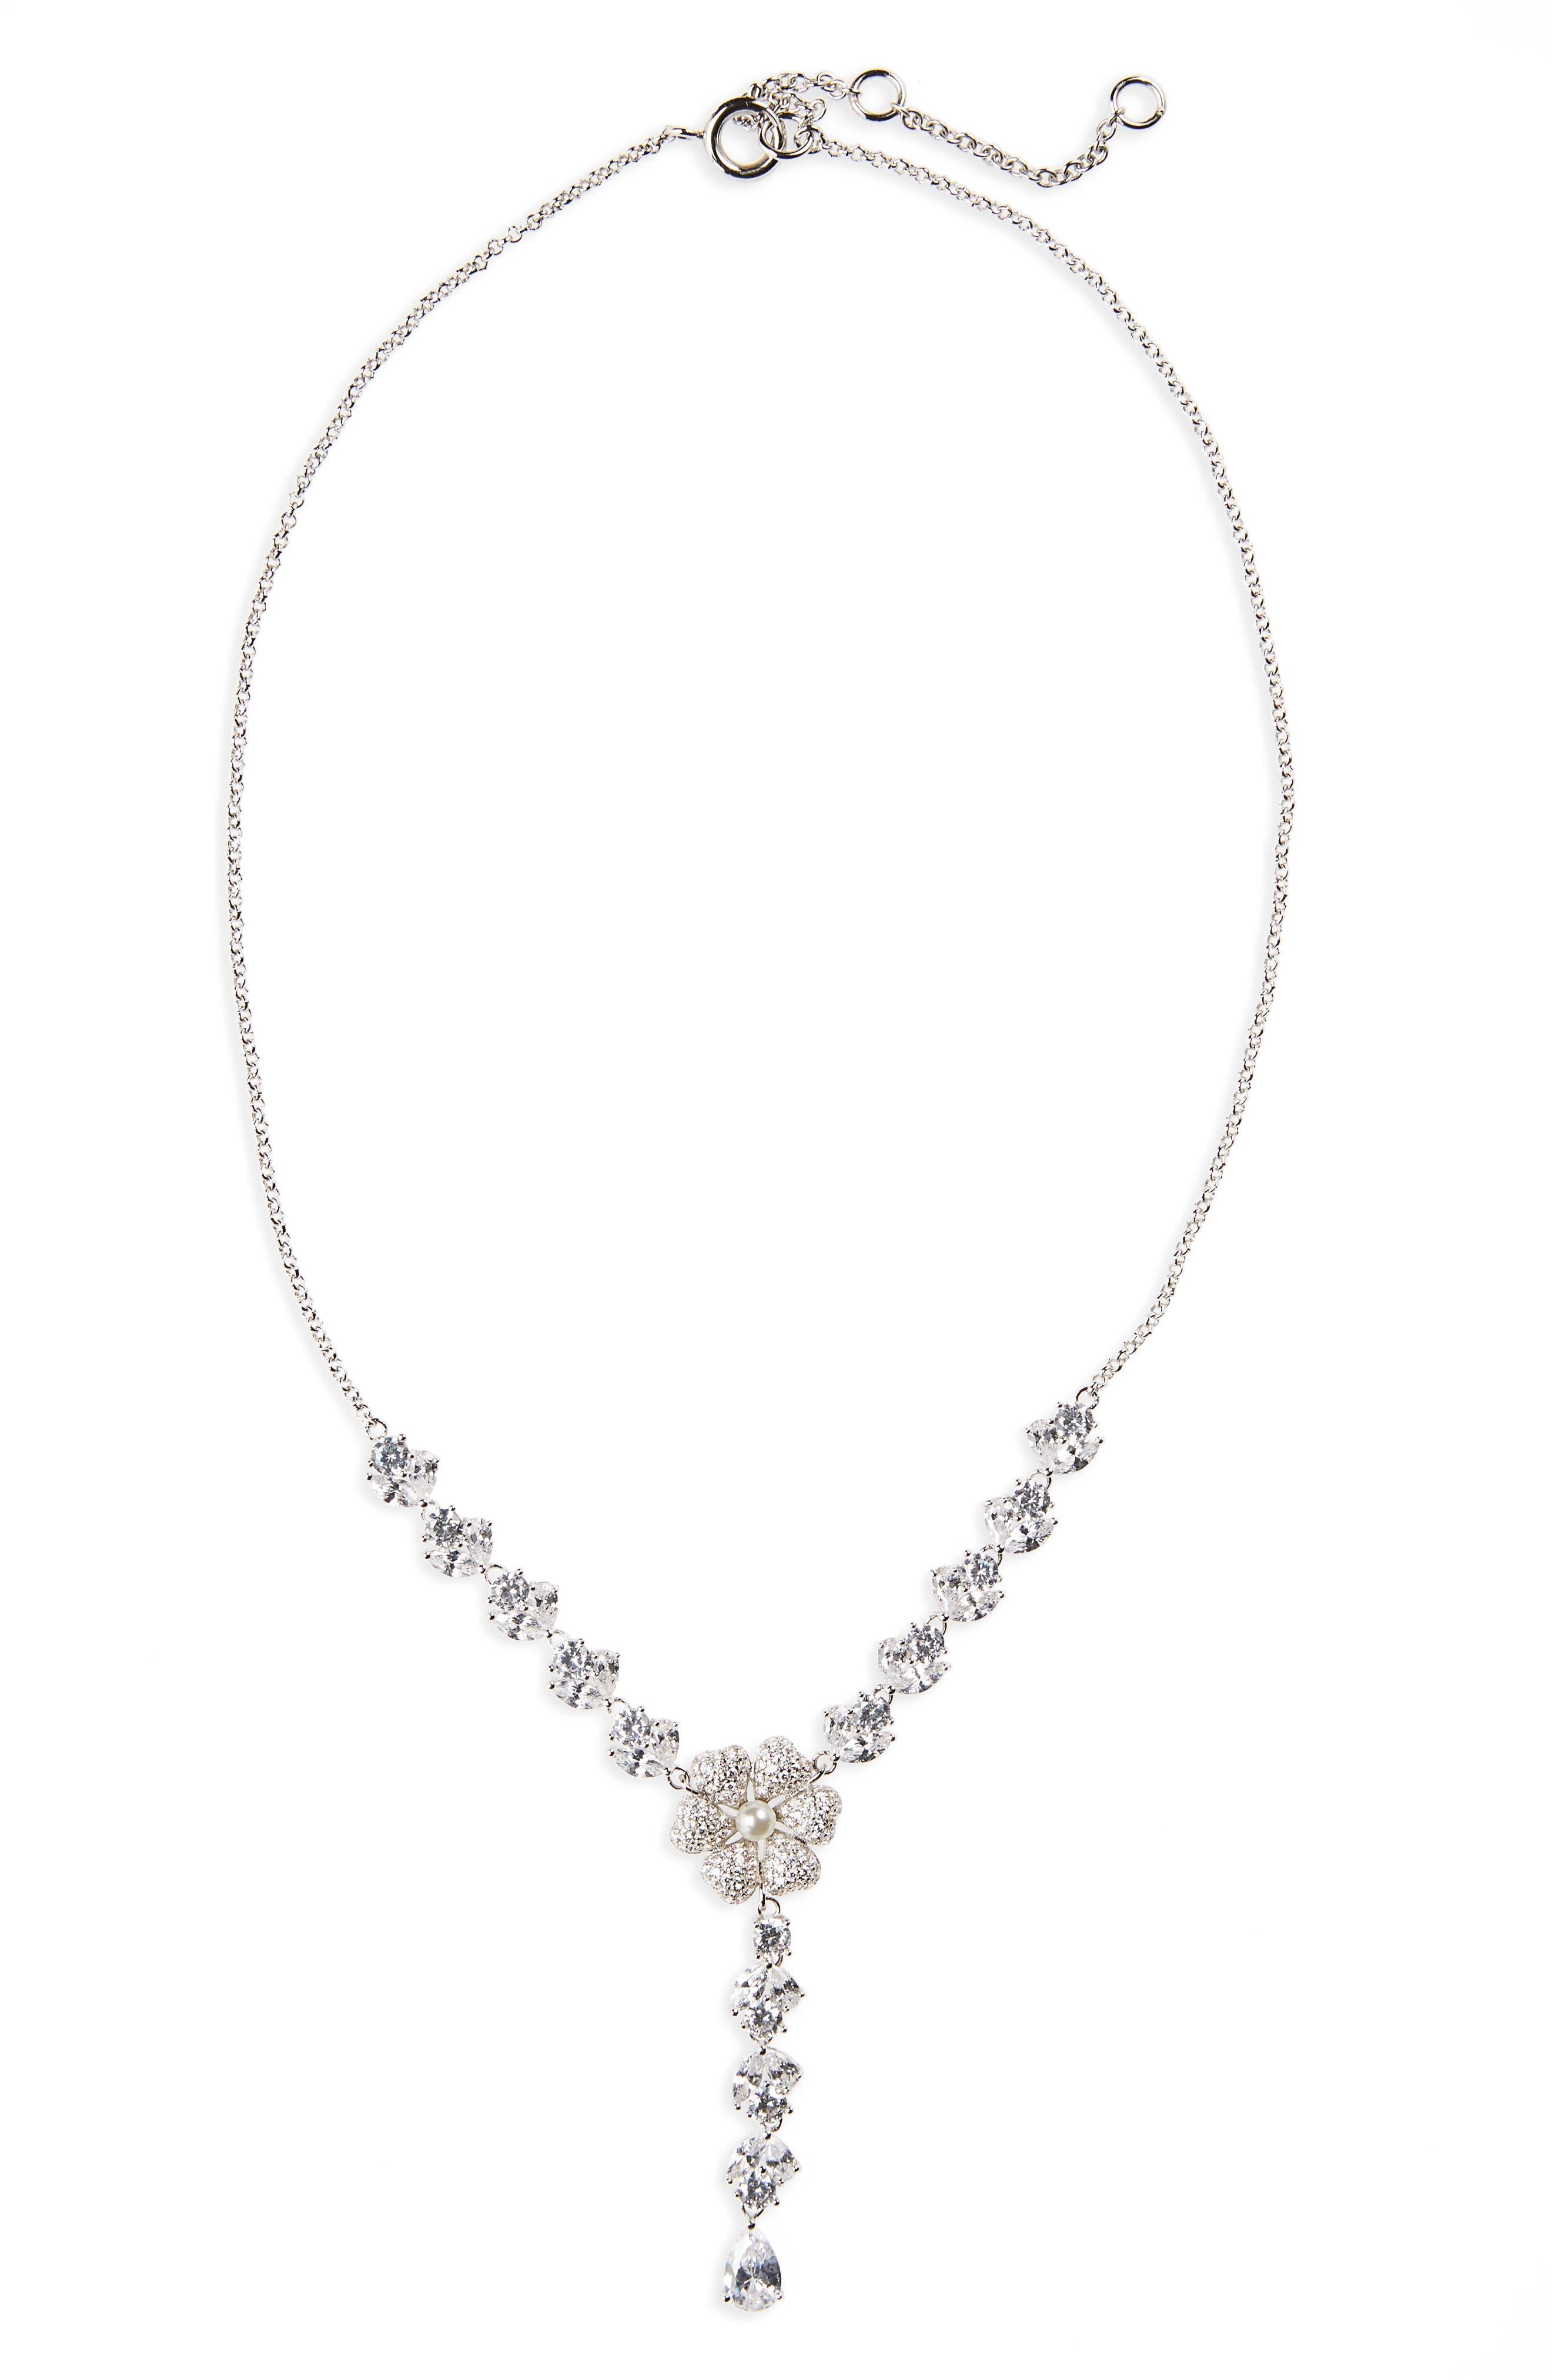 Swarovski Crystal & Imitation Pearl Flower Y-Necklace,                         Main,                         color, Ivory Pearl / Silver